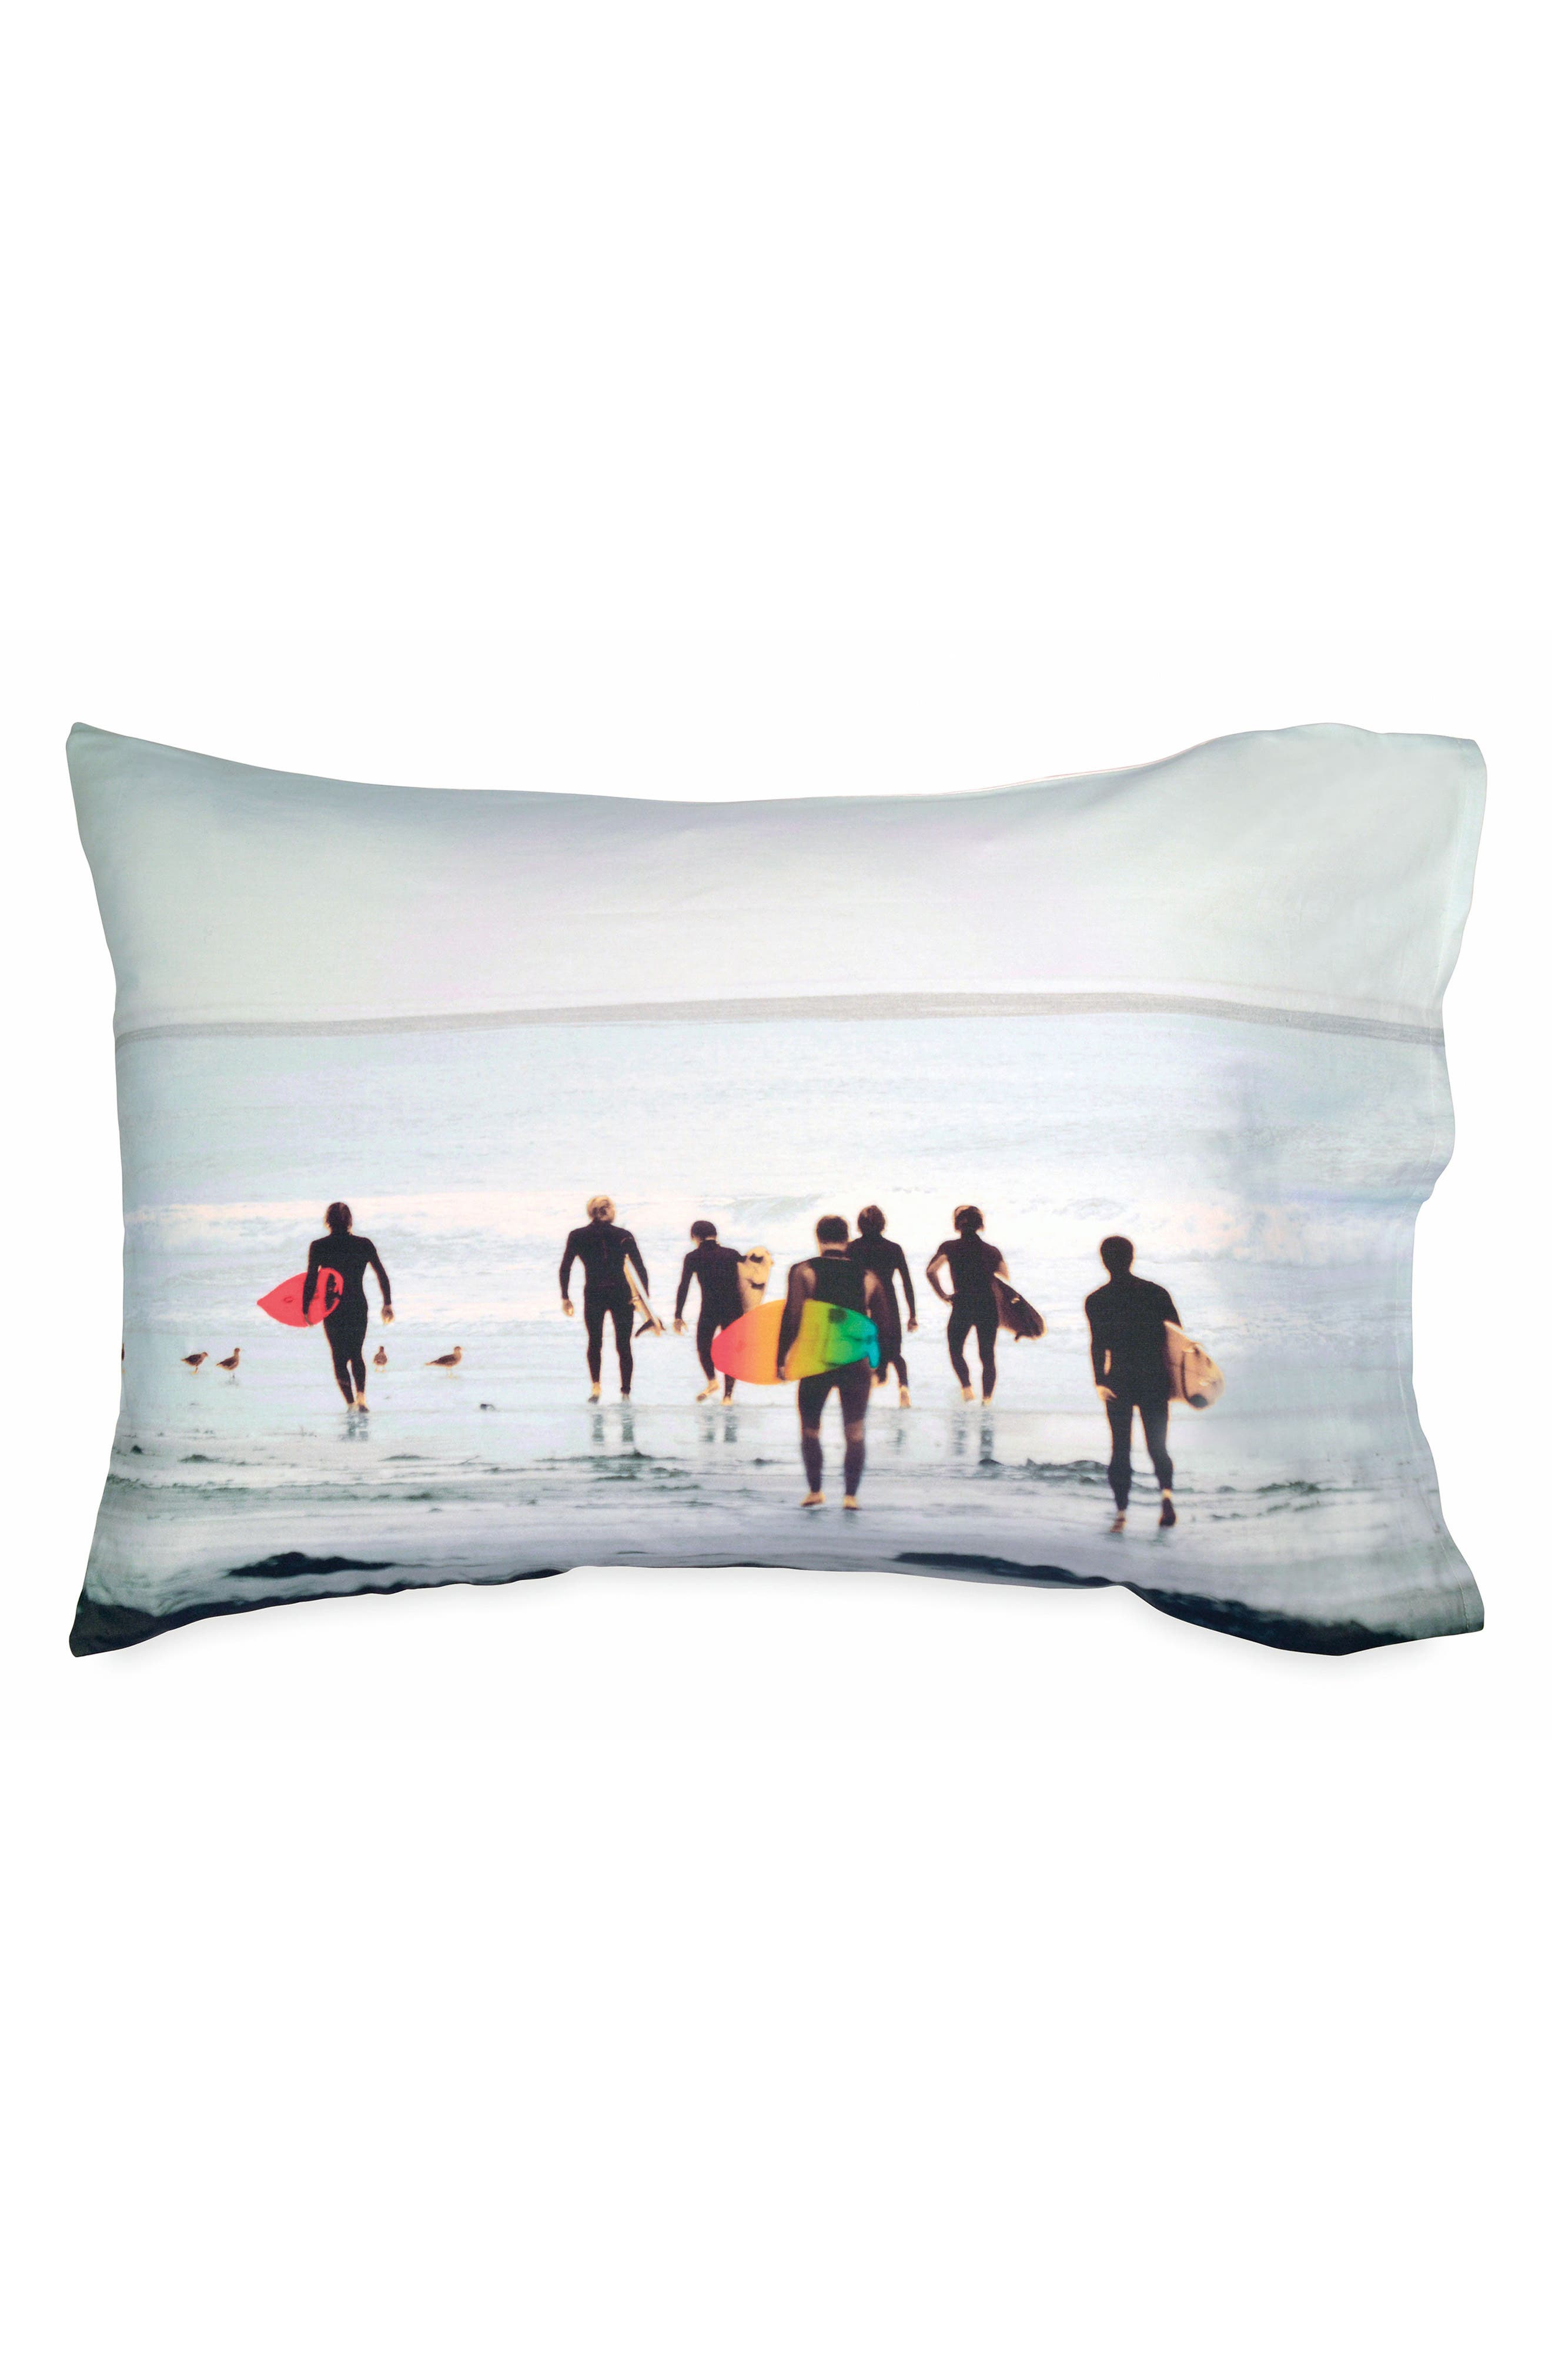 Main Image - Hang Ten Surfers Pillowcase